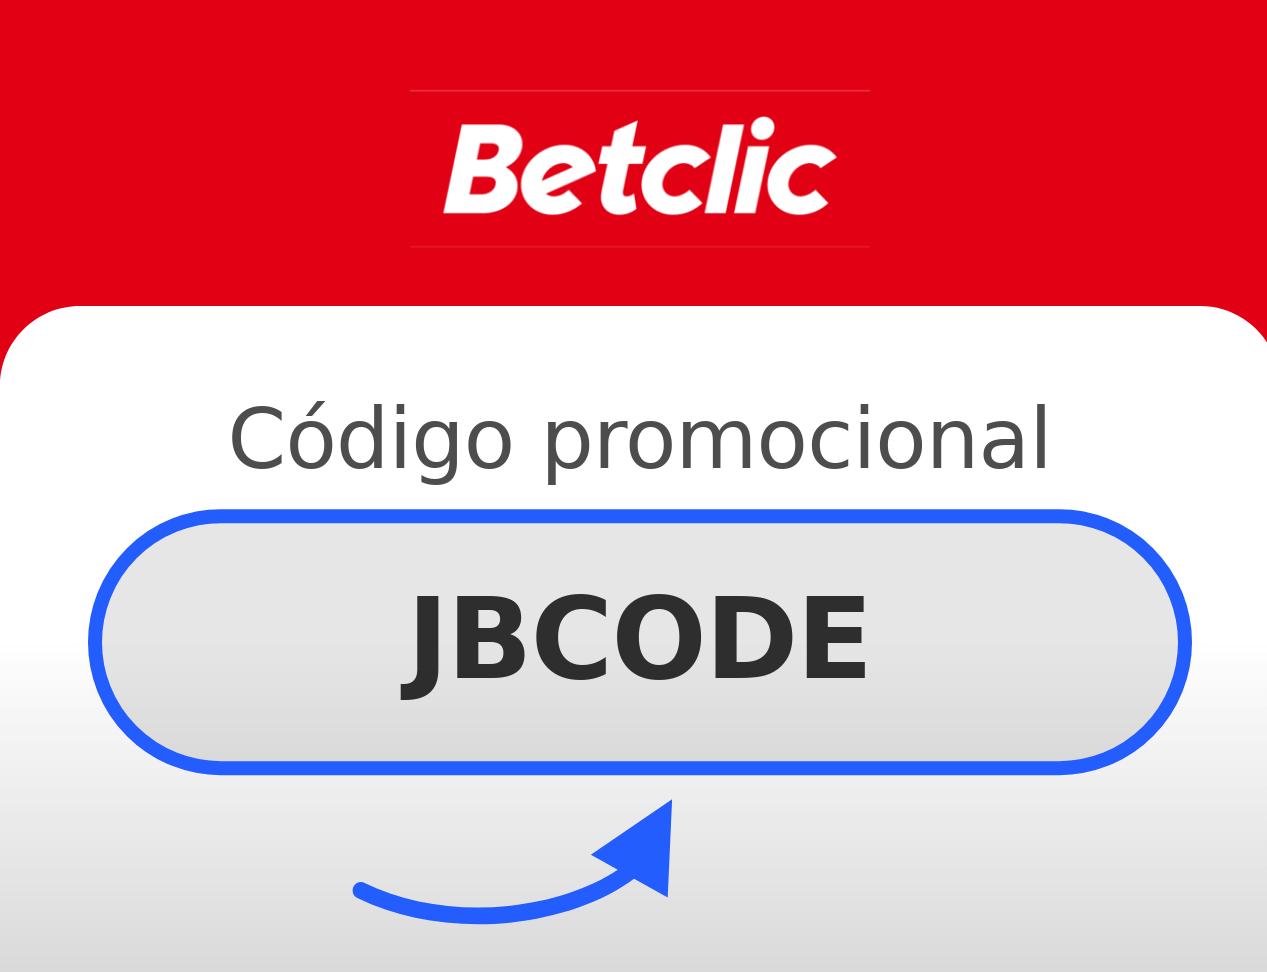 Código Promocional Betclic